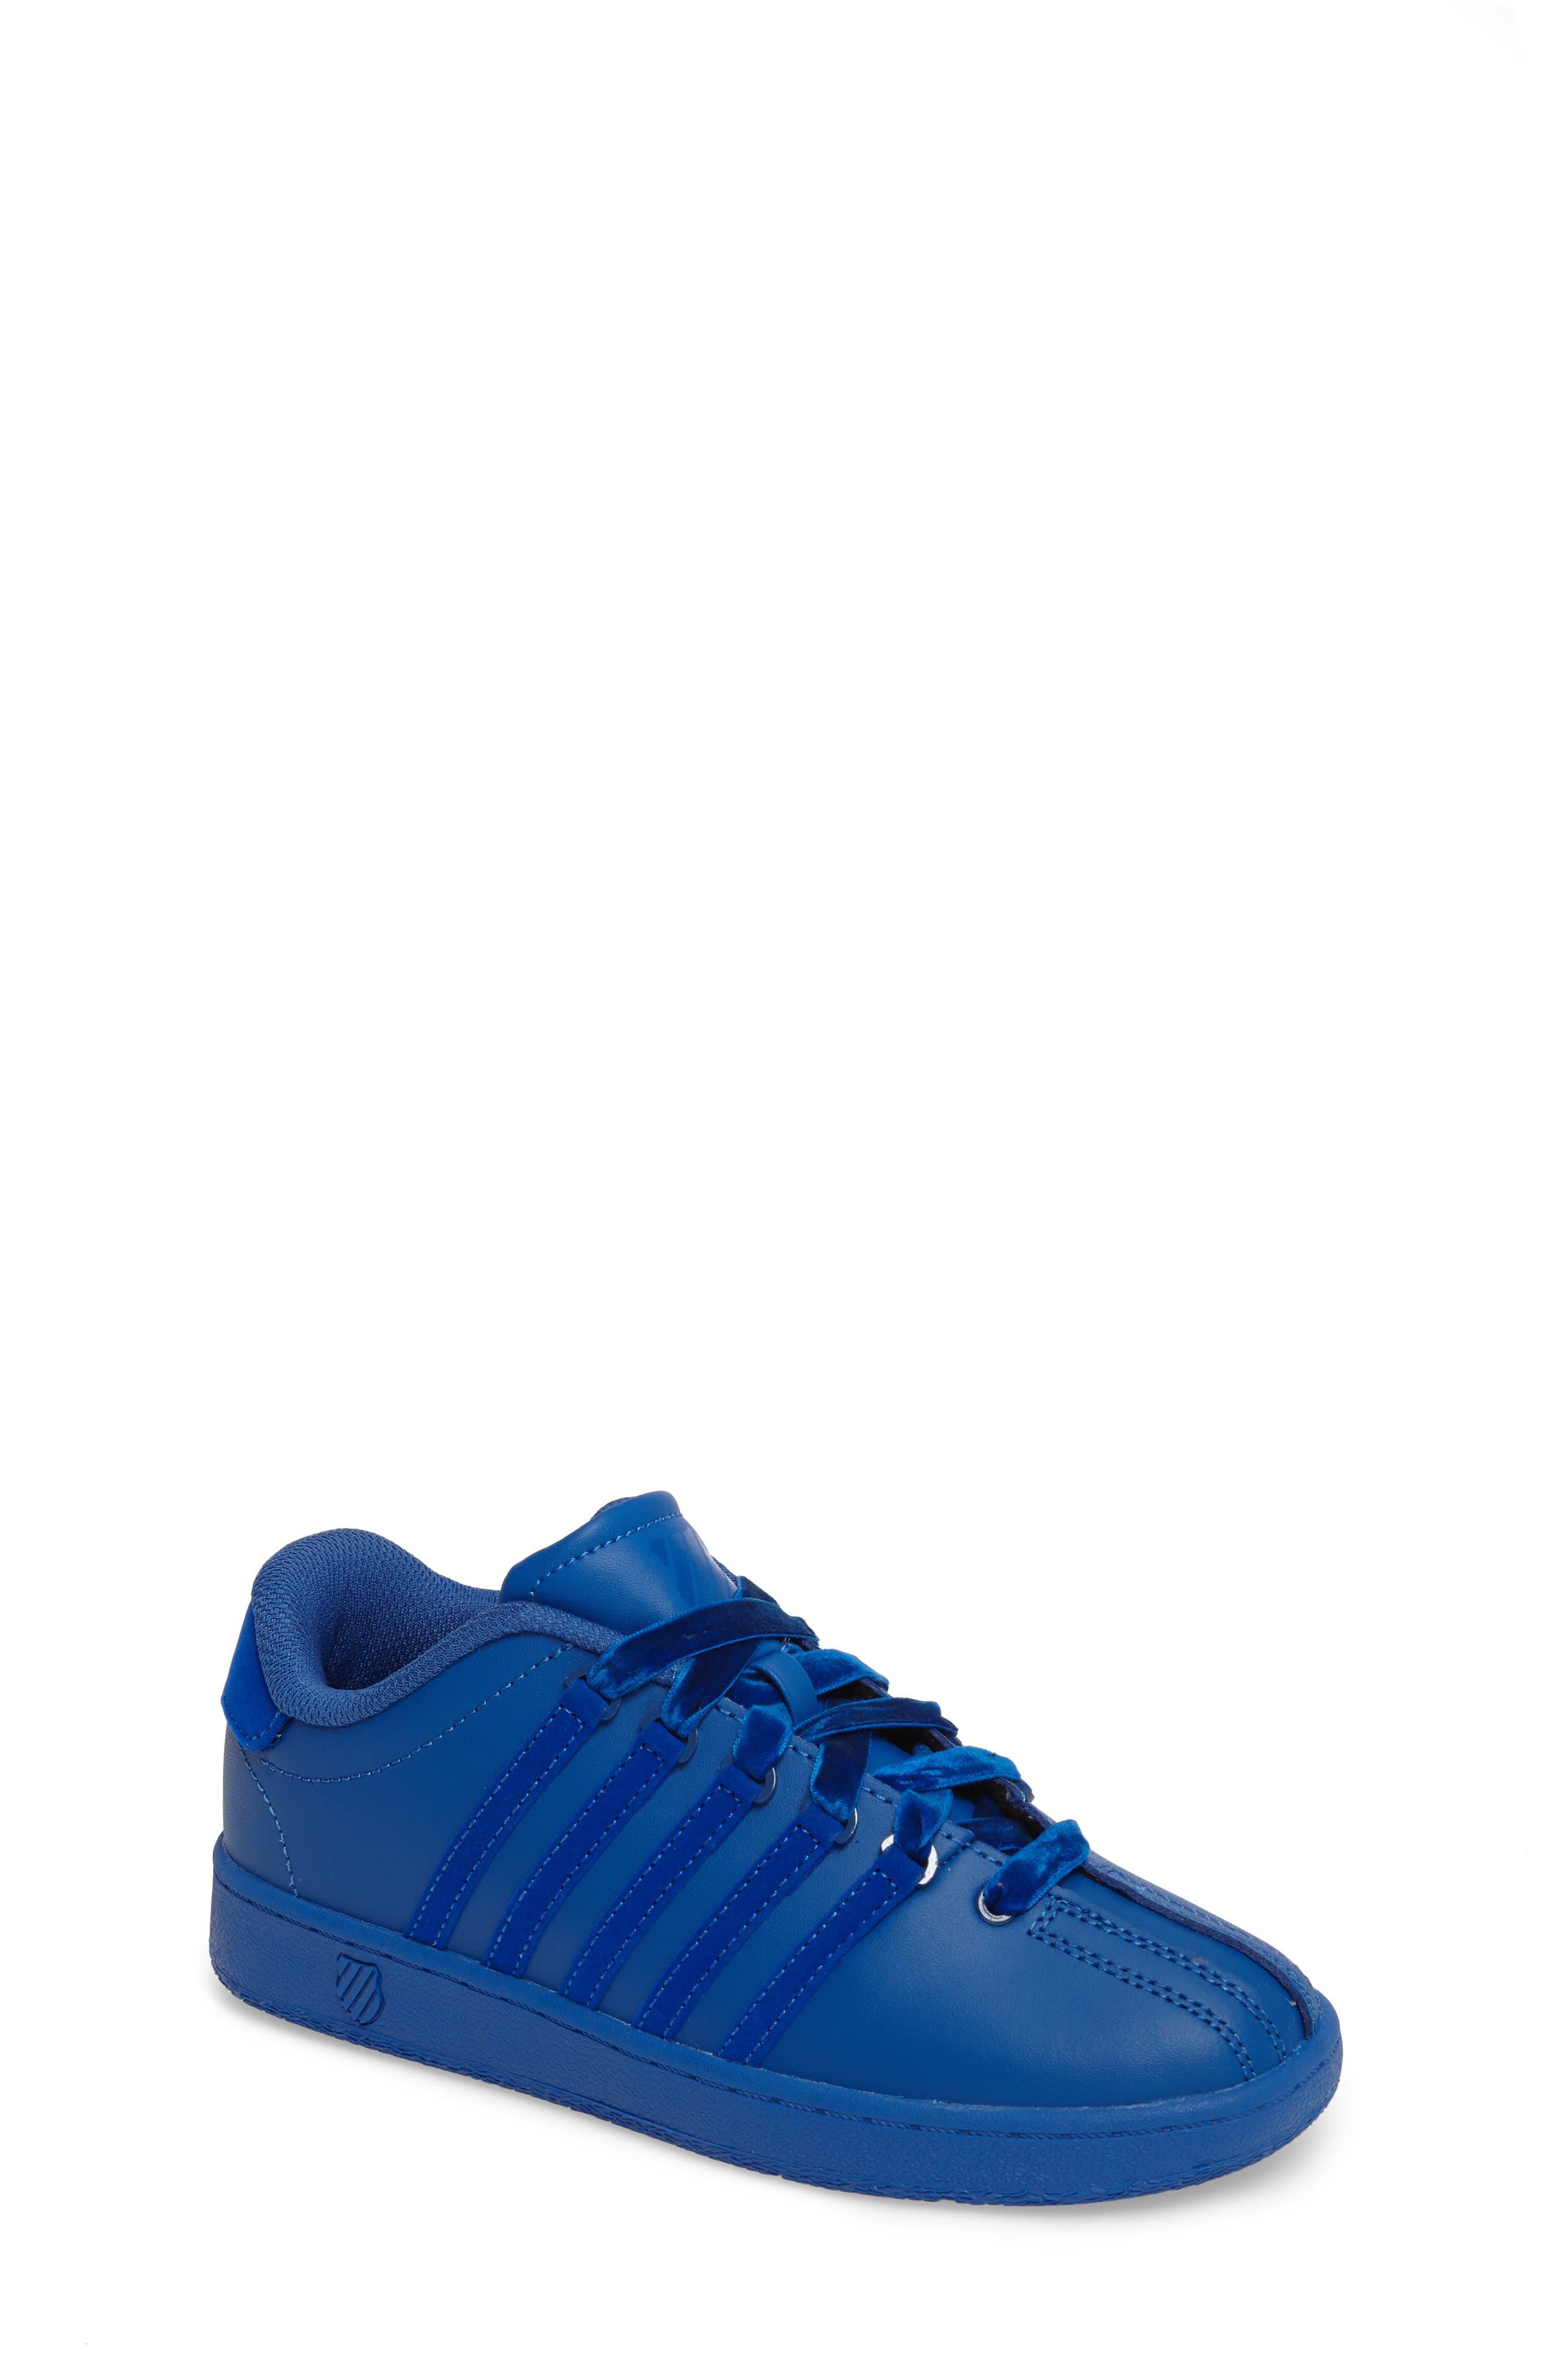 Main Image - K-Swiss Classic VN Sneaker (Big Kid)